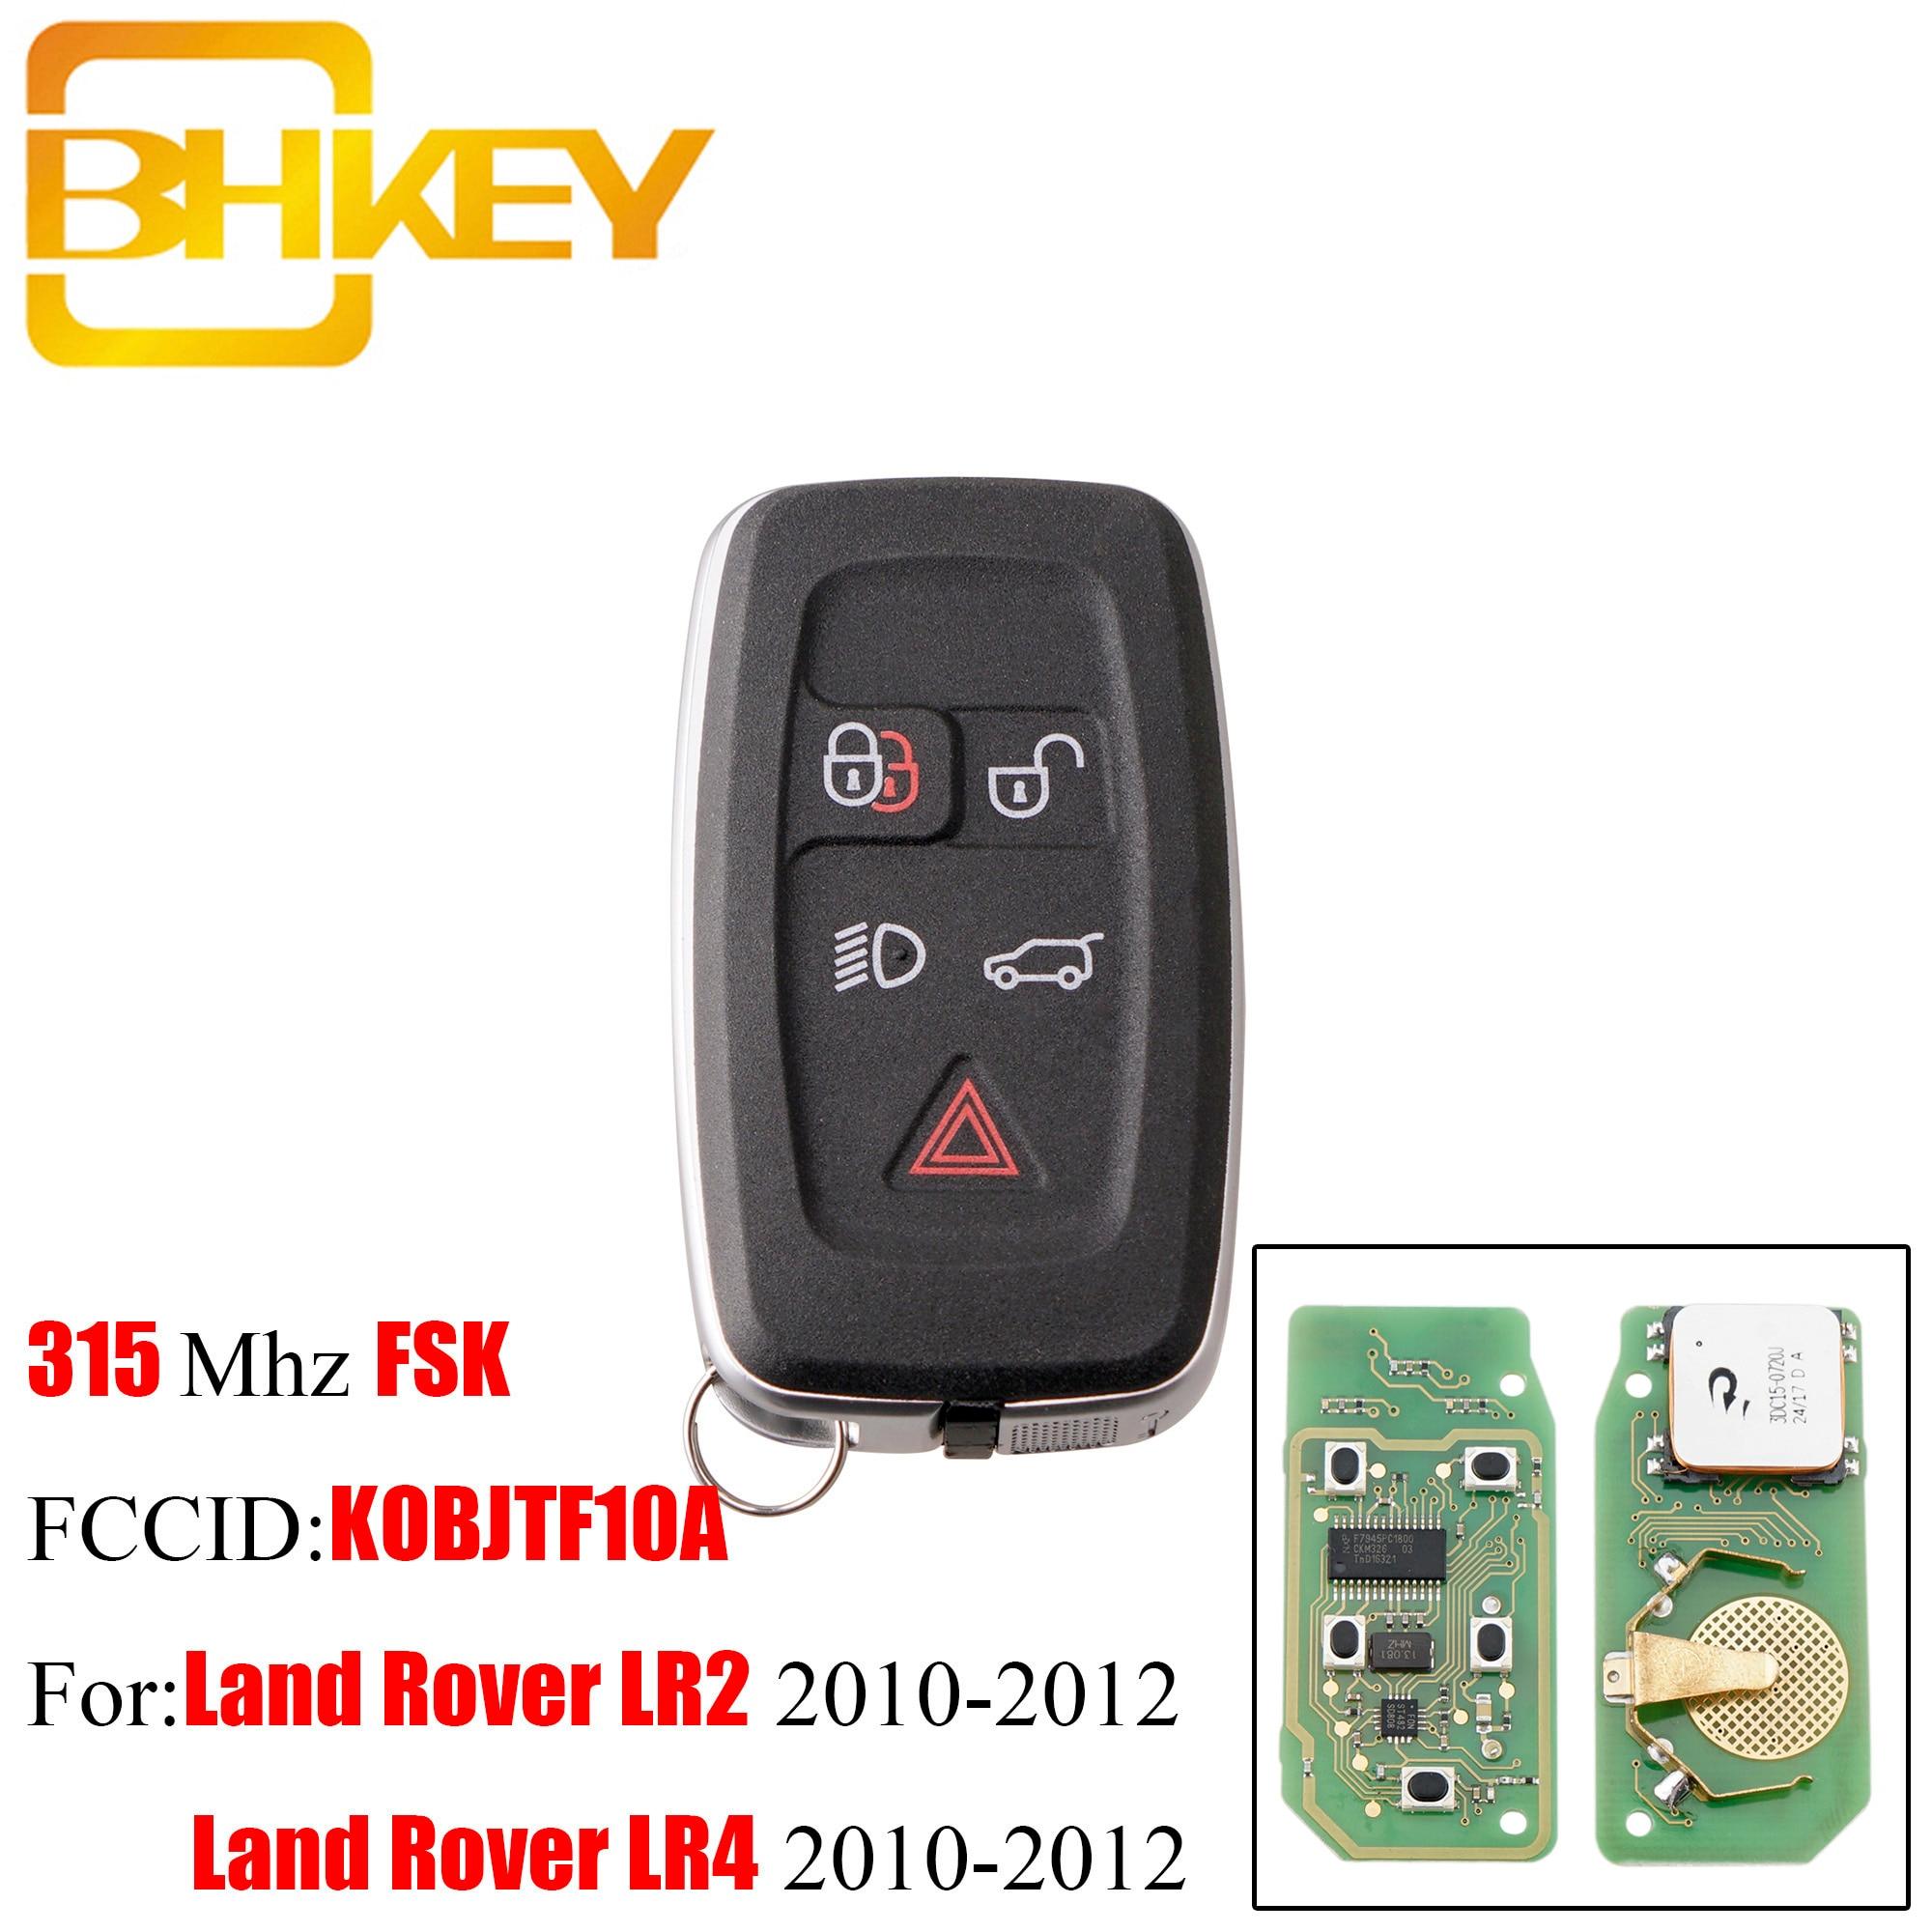 BHKEY 315Mhz 433Mhz 5Buttons Remote key Fob For Land Rover LR4 Range Rover Evoque Sport KOBJTF10A Original remote control key